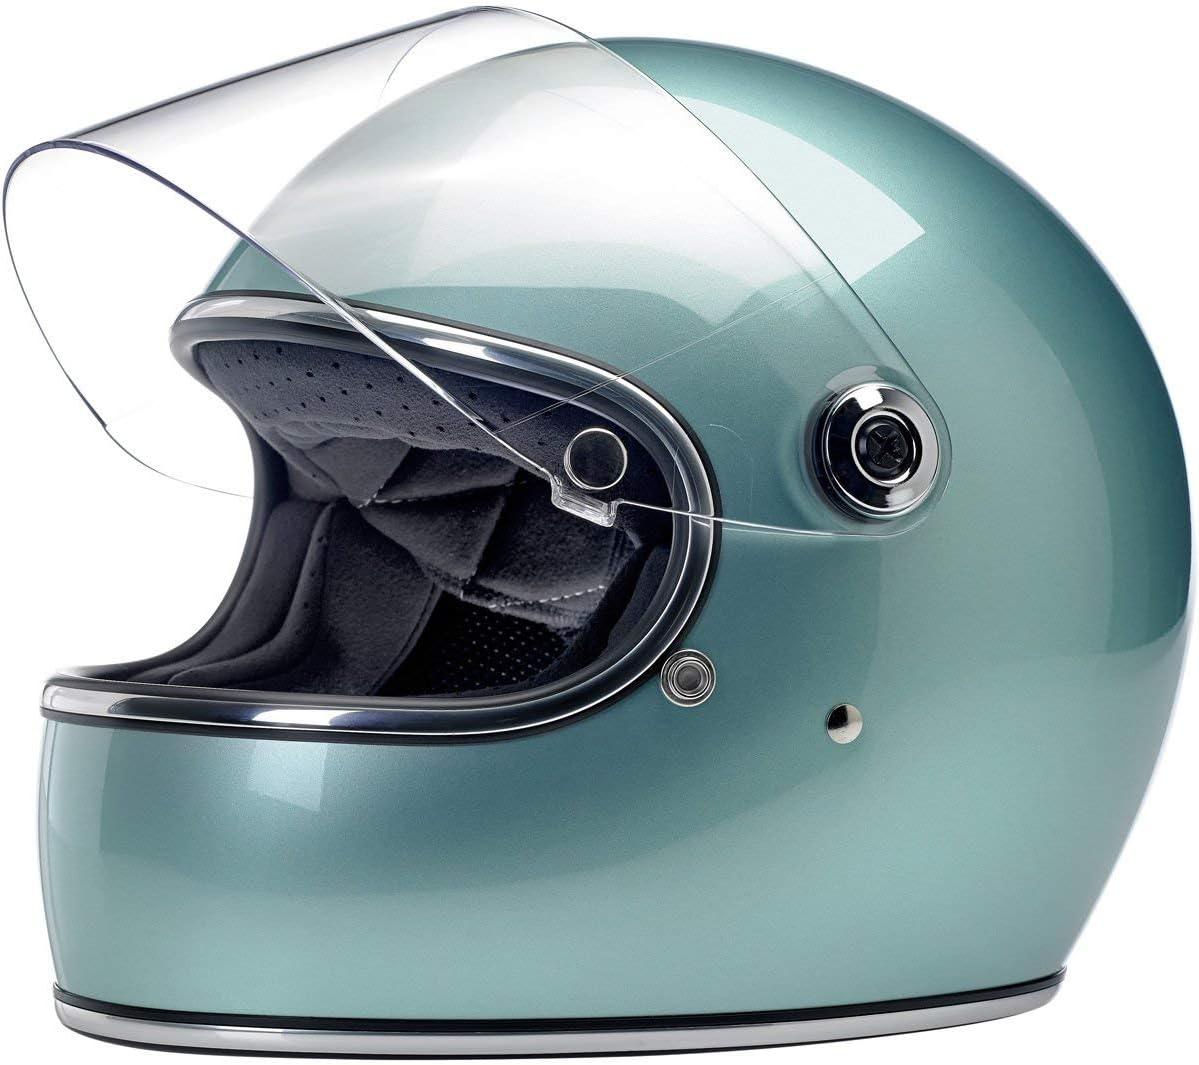 Europa America Integralhelm Biltwell Gringo S Schwarz gl/änzend Gloss Black Spectrum zugelassen Doppelt zugelassen ECE Helmet Biker Custom Vintage Retro Anno 70 Gr/ö/ße XL /& DOT